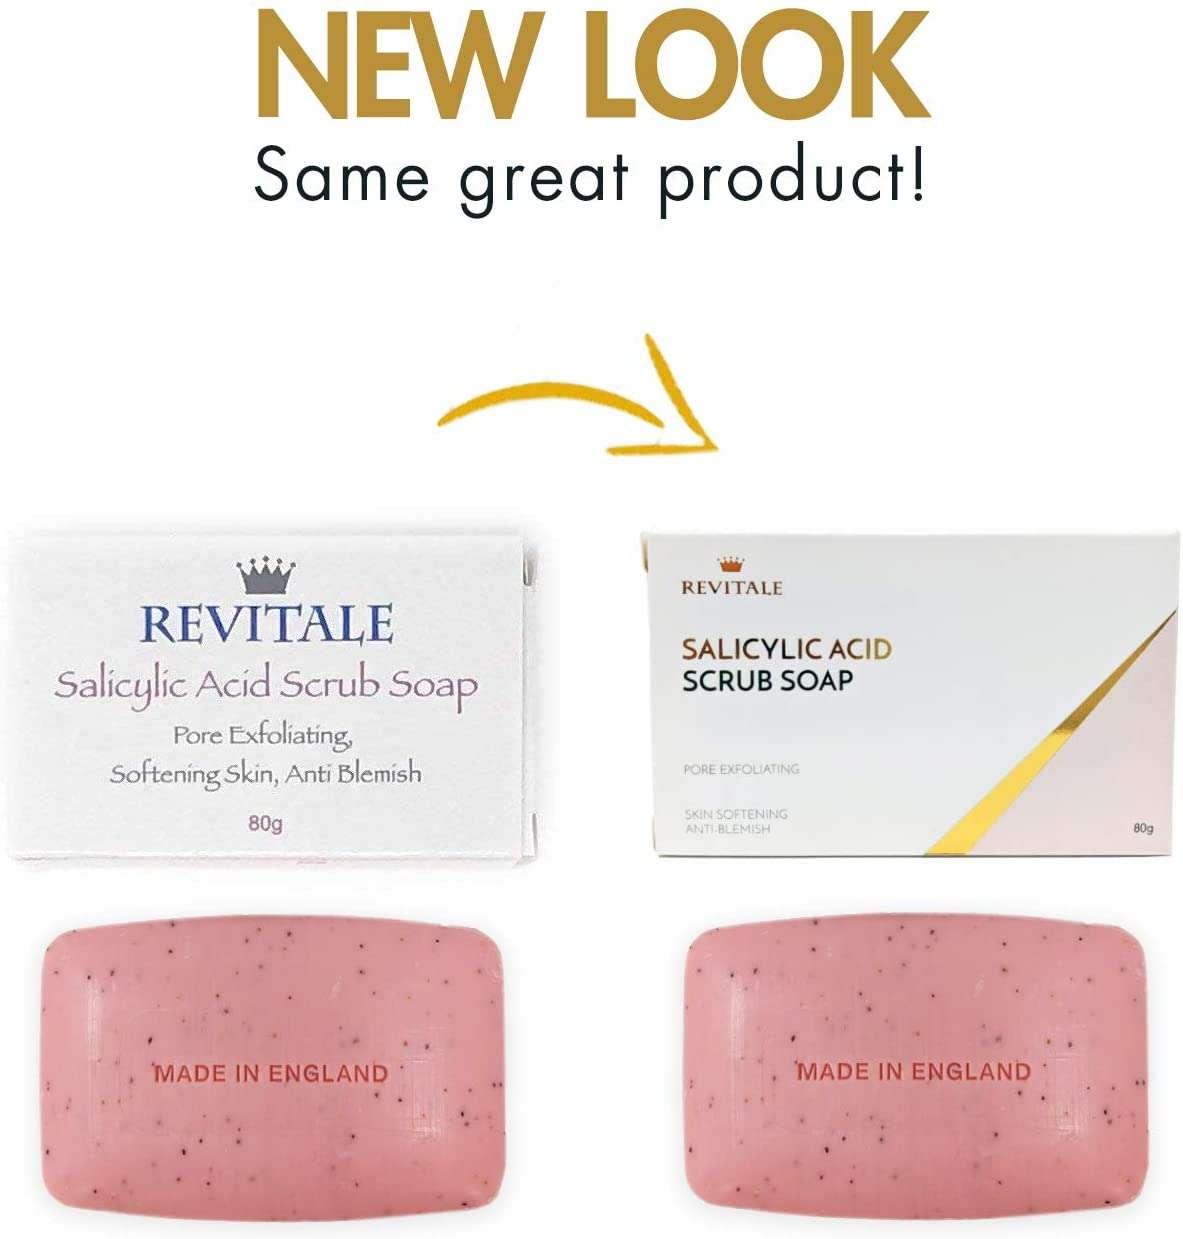 Revitale- Jabón exfoliante con ácido salicílico. presentación